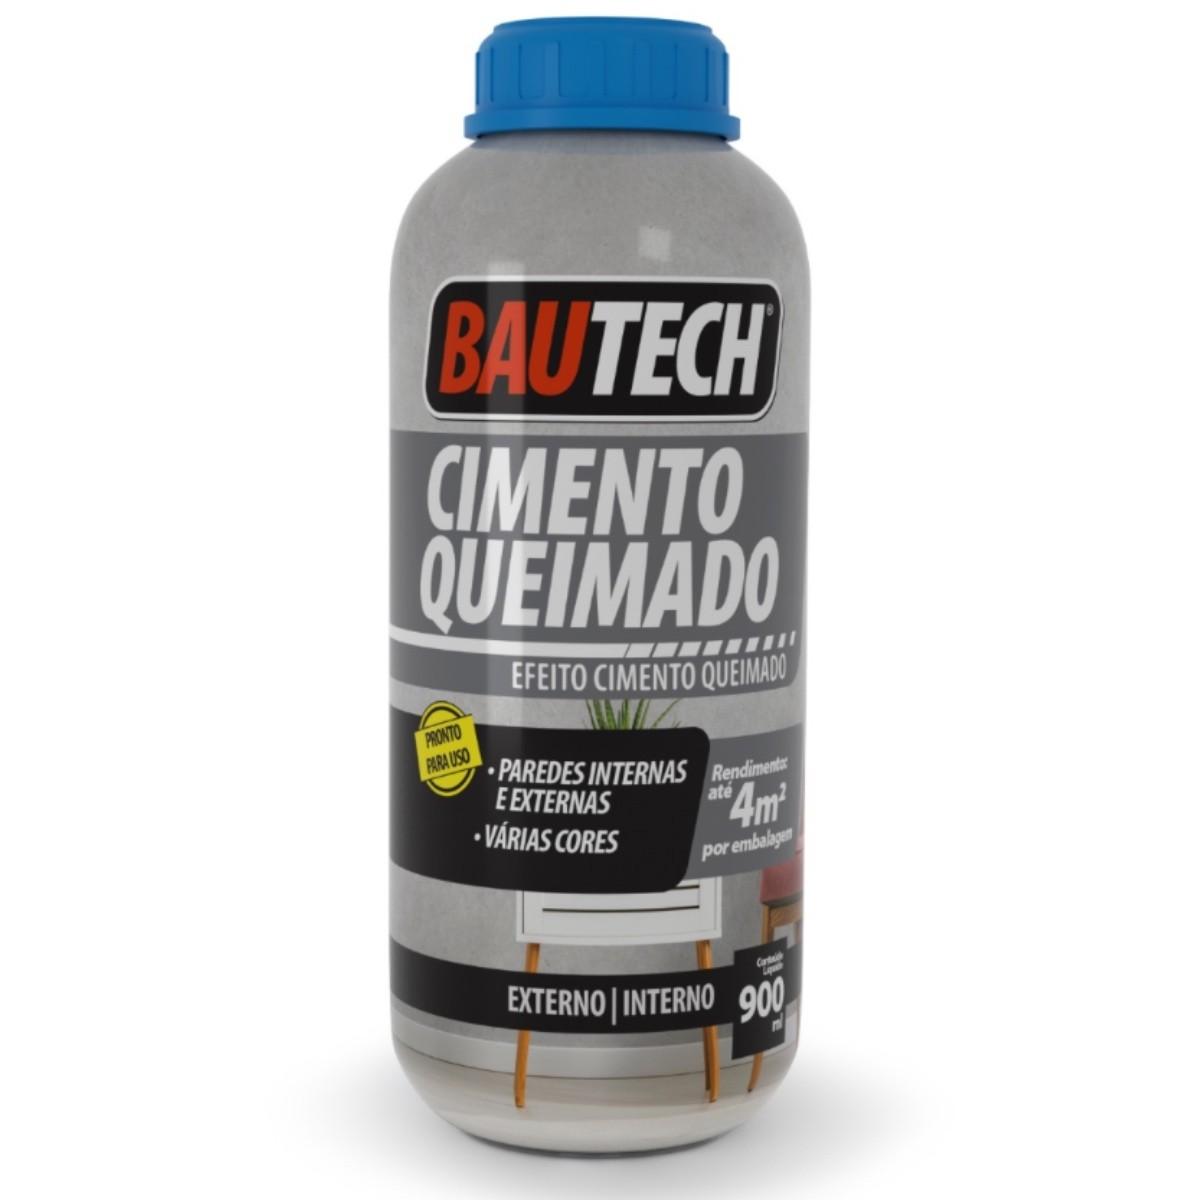 Efeito Cimento Queimado Líquido Bautech 900ml - Cores